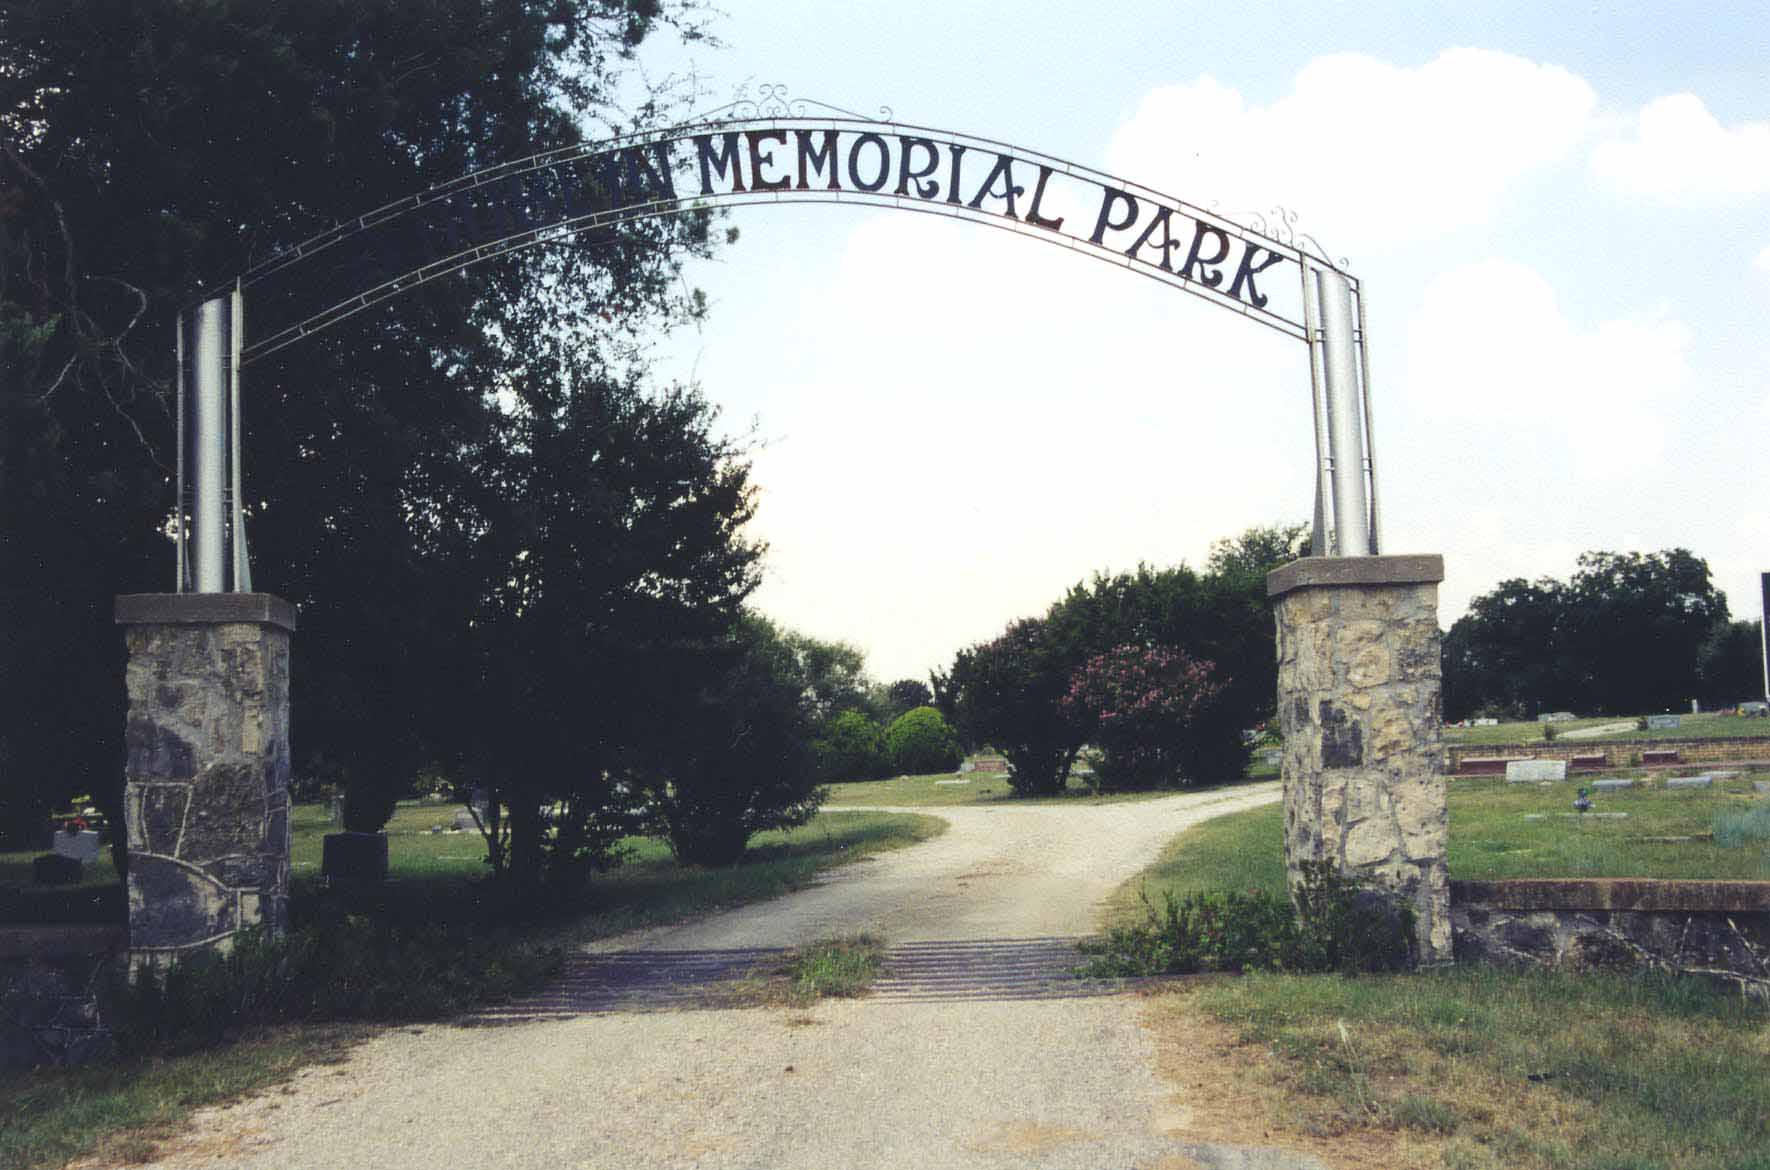 Old Dublin Memorial Park